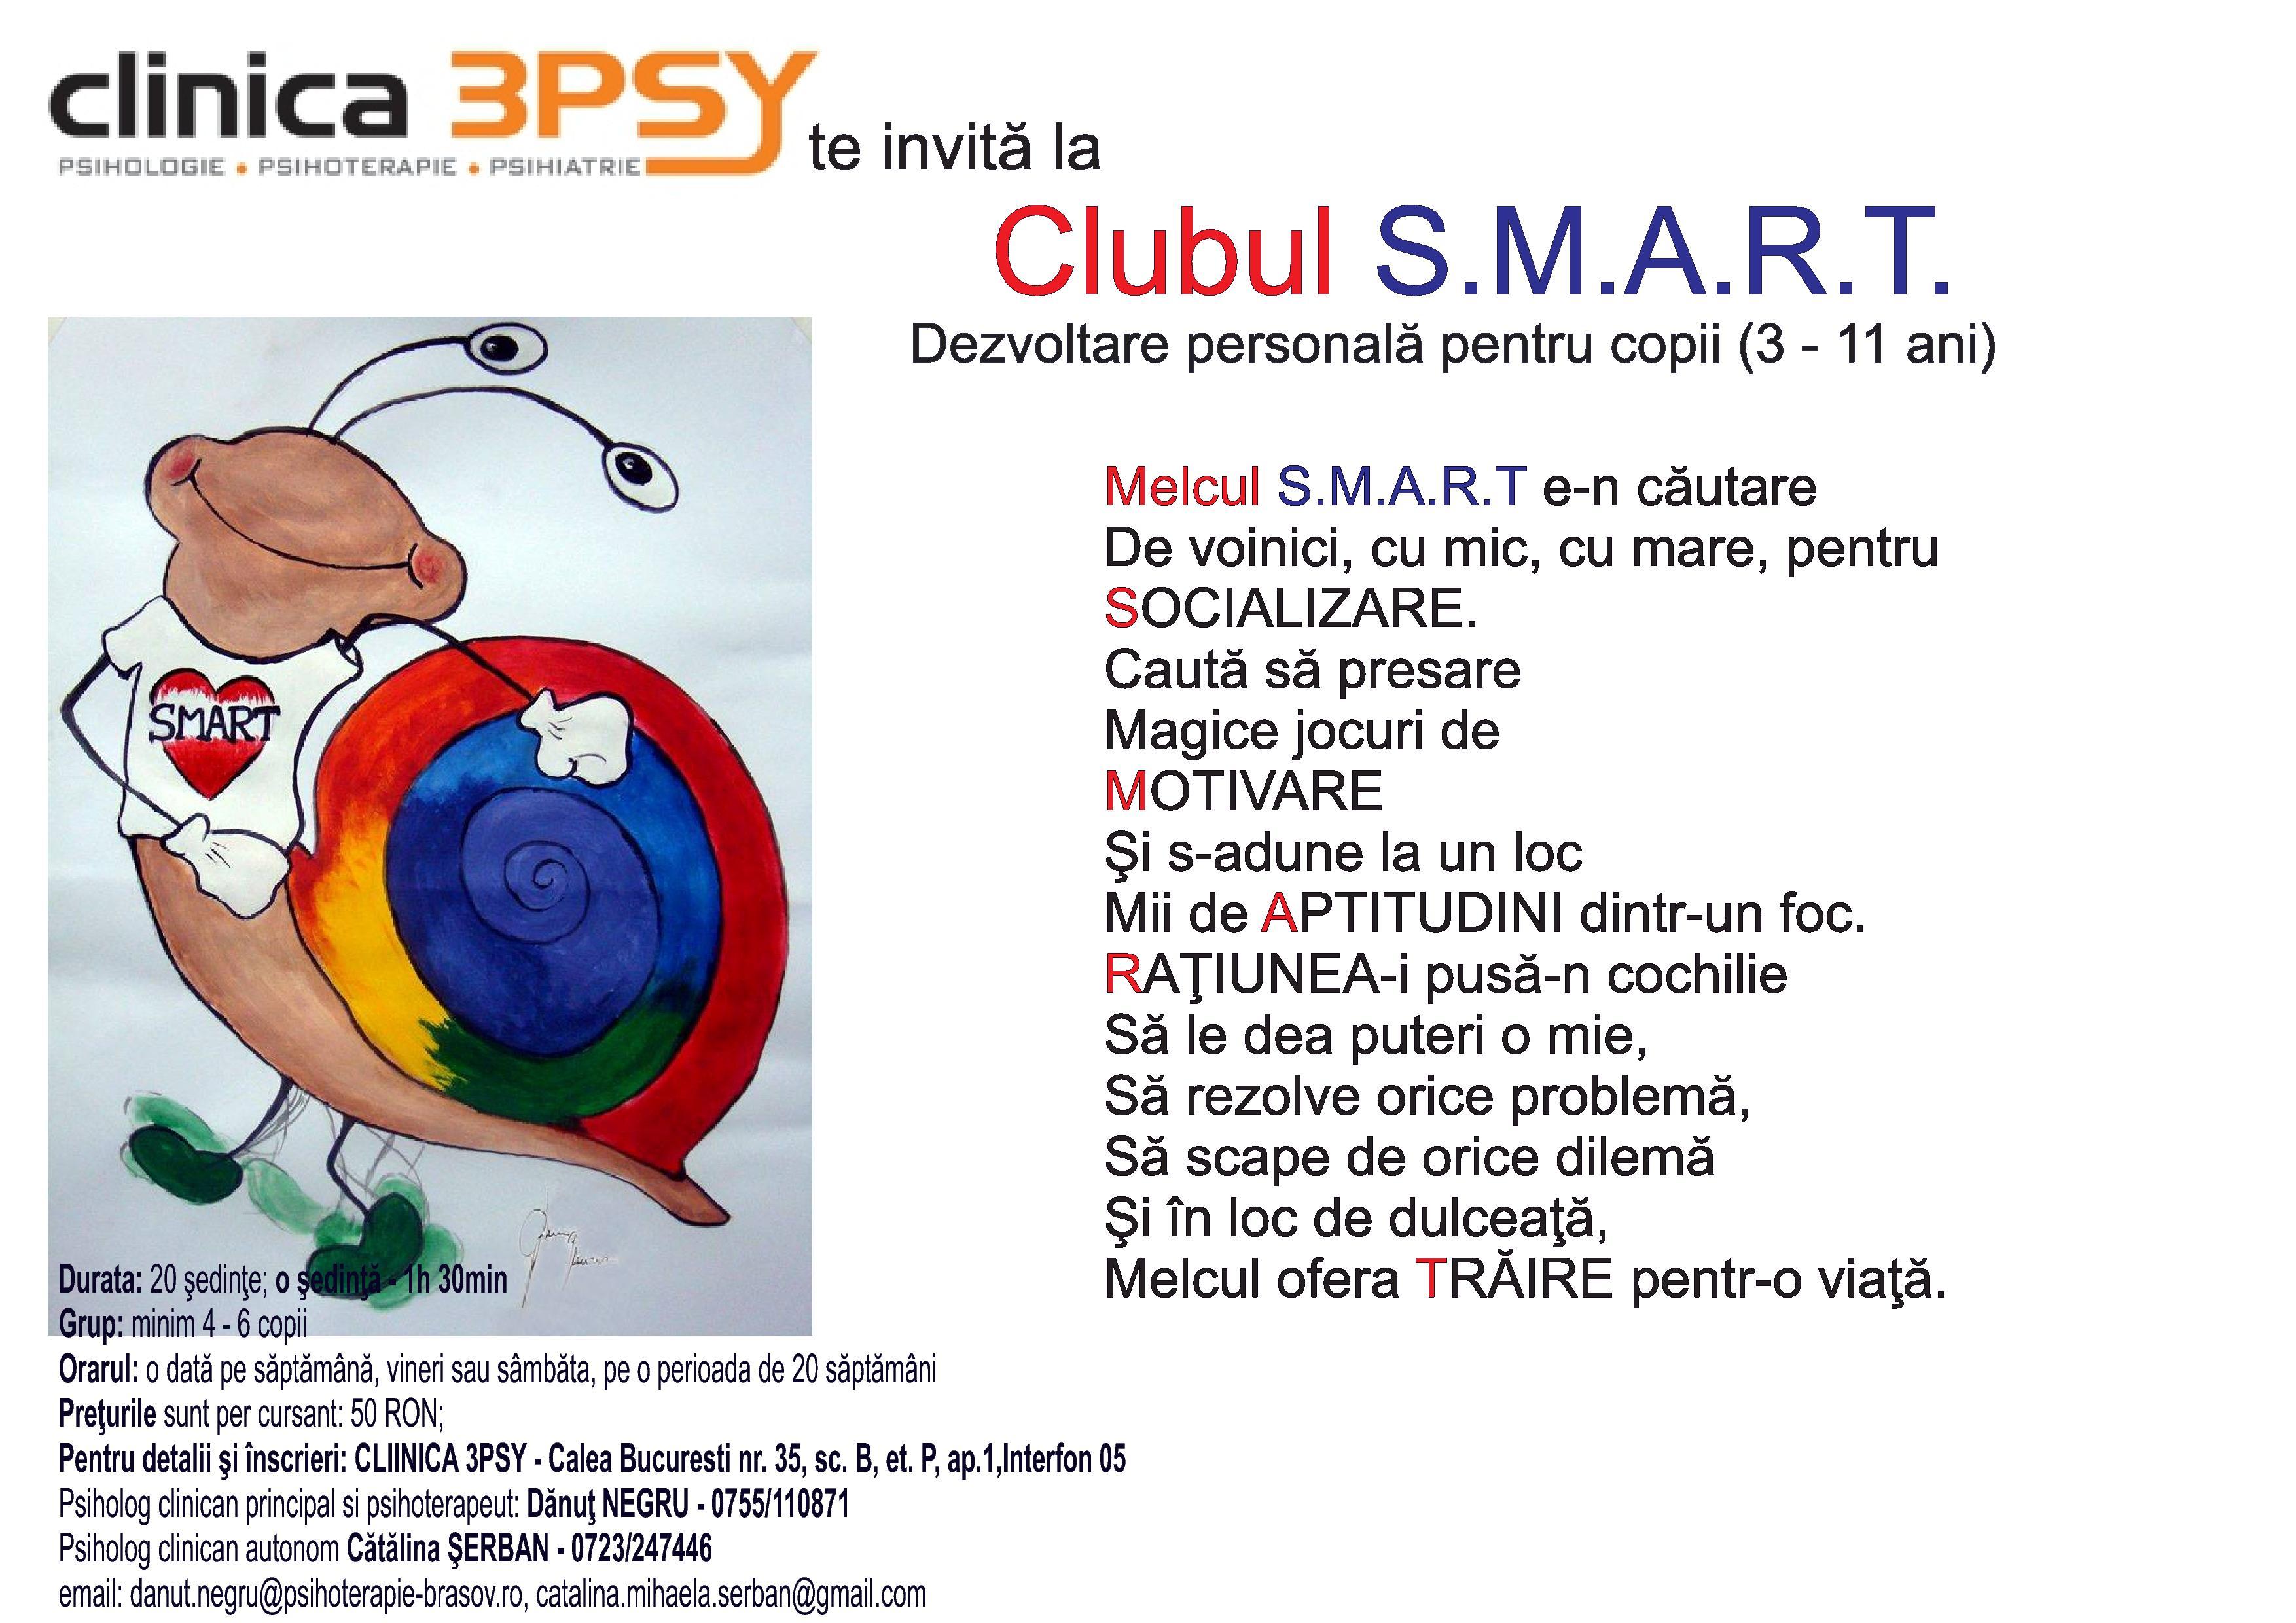 Clubul S.M.A.R.T